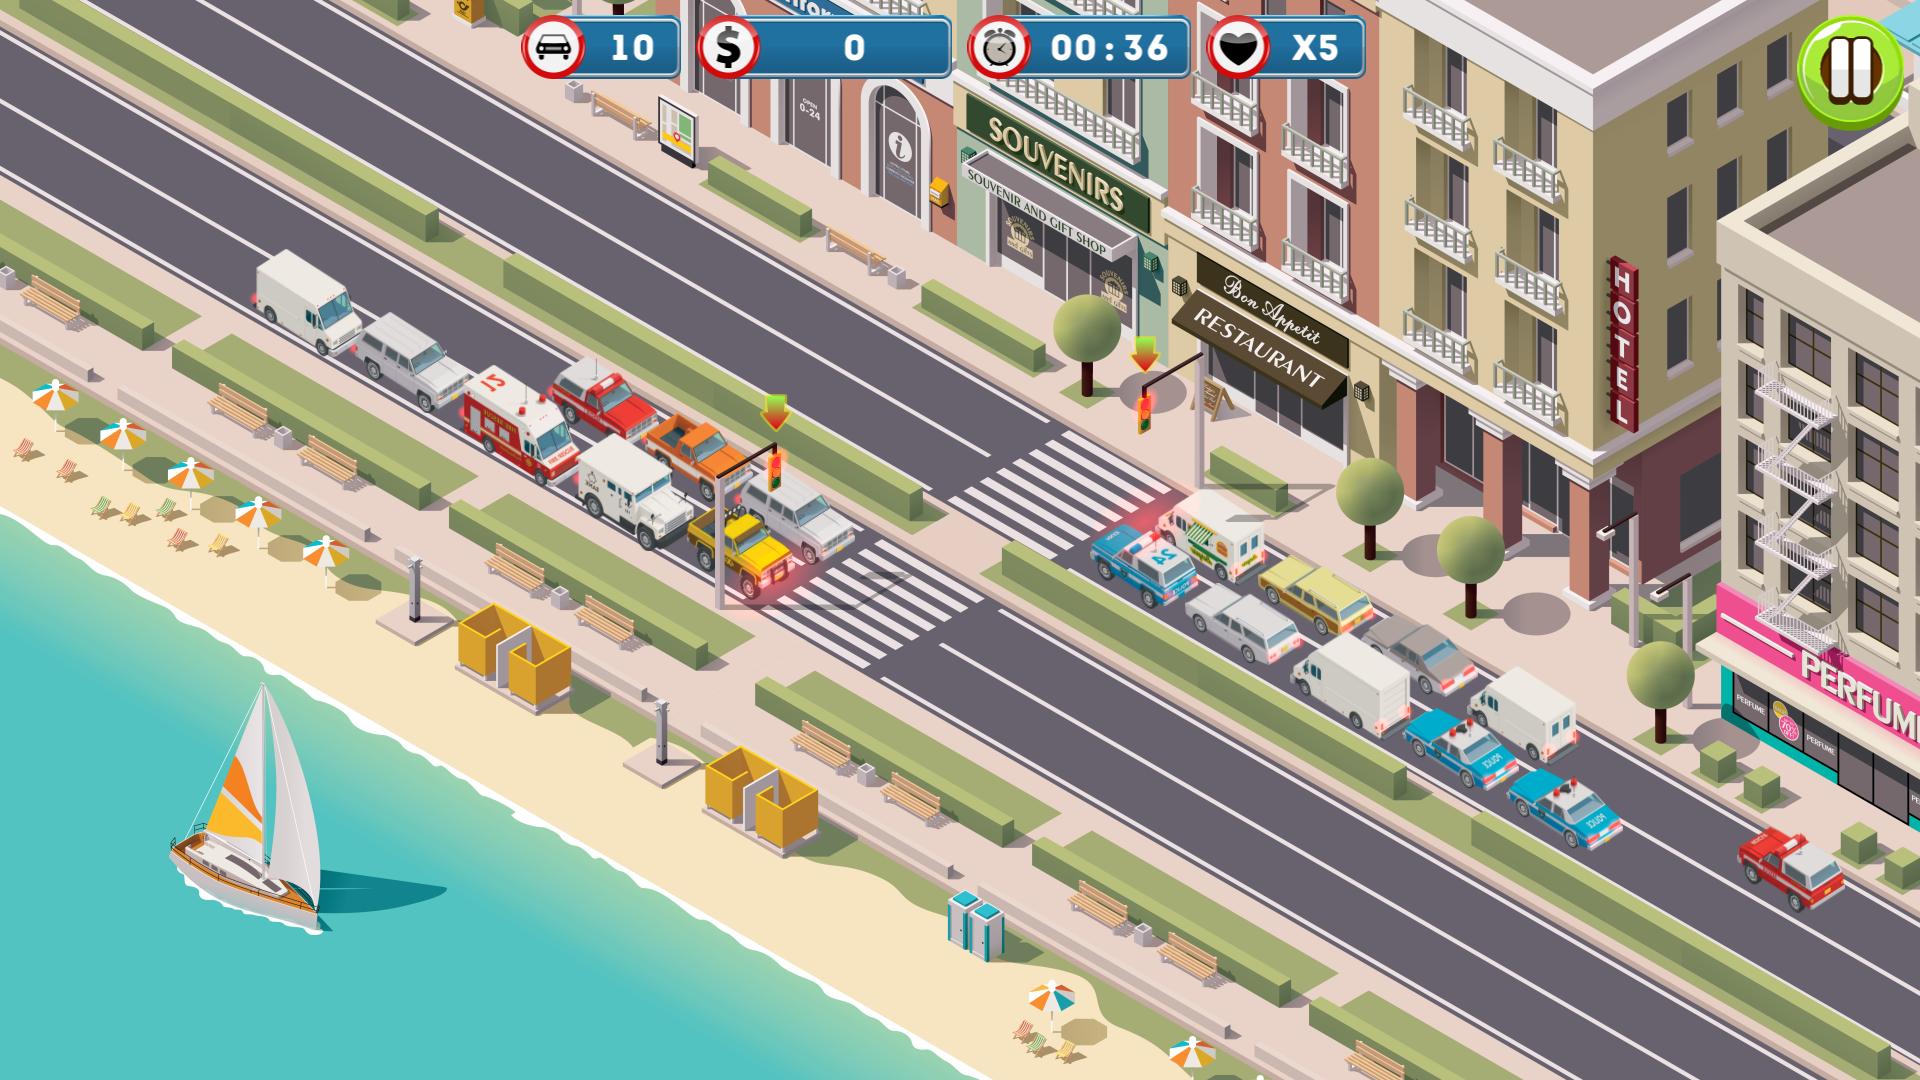 Traffic command game 2 jupiters casino show seating